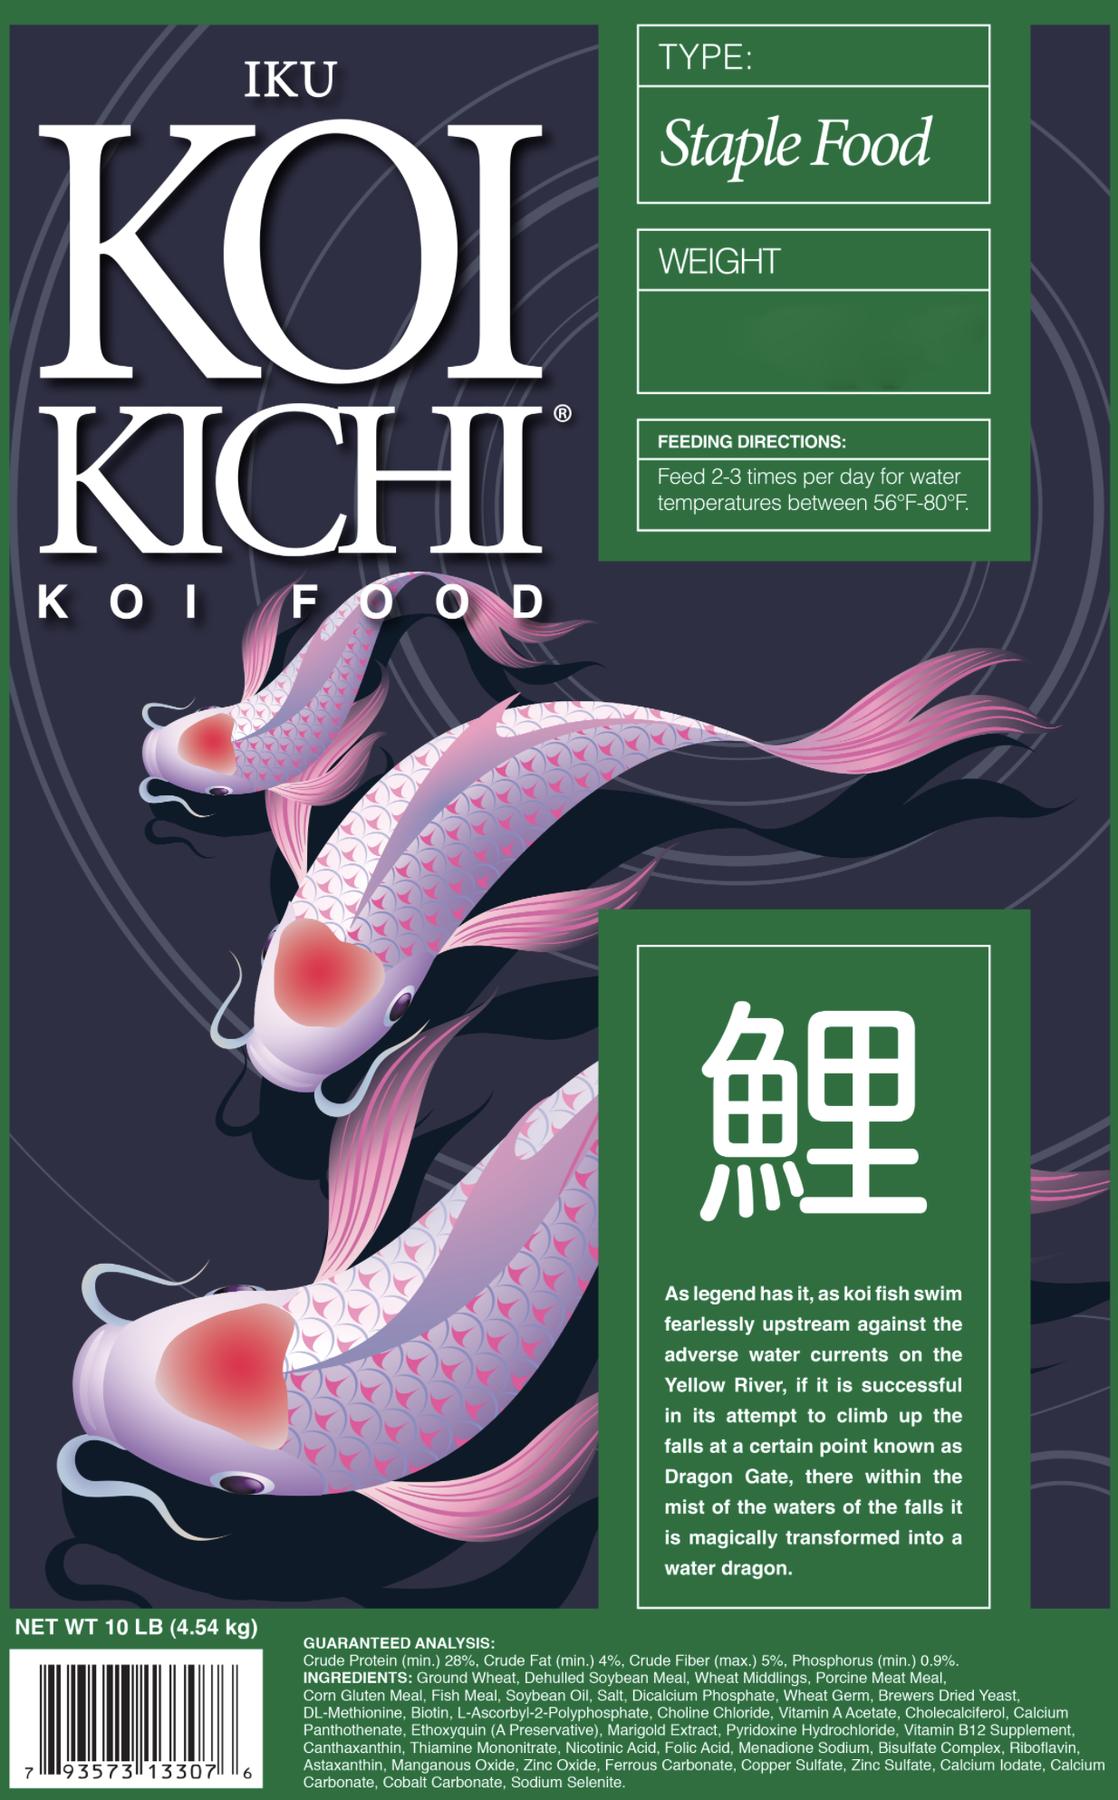 Iku Koi Kichi Staple Koi Fish Food - 40 lbs.